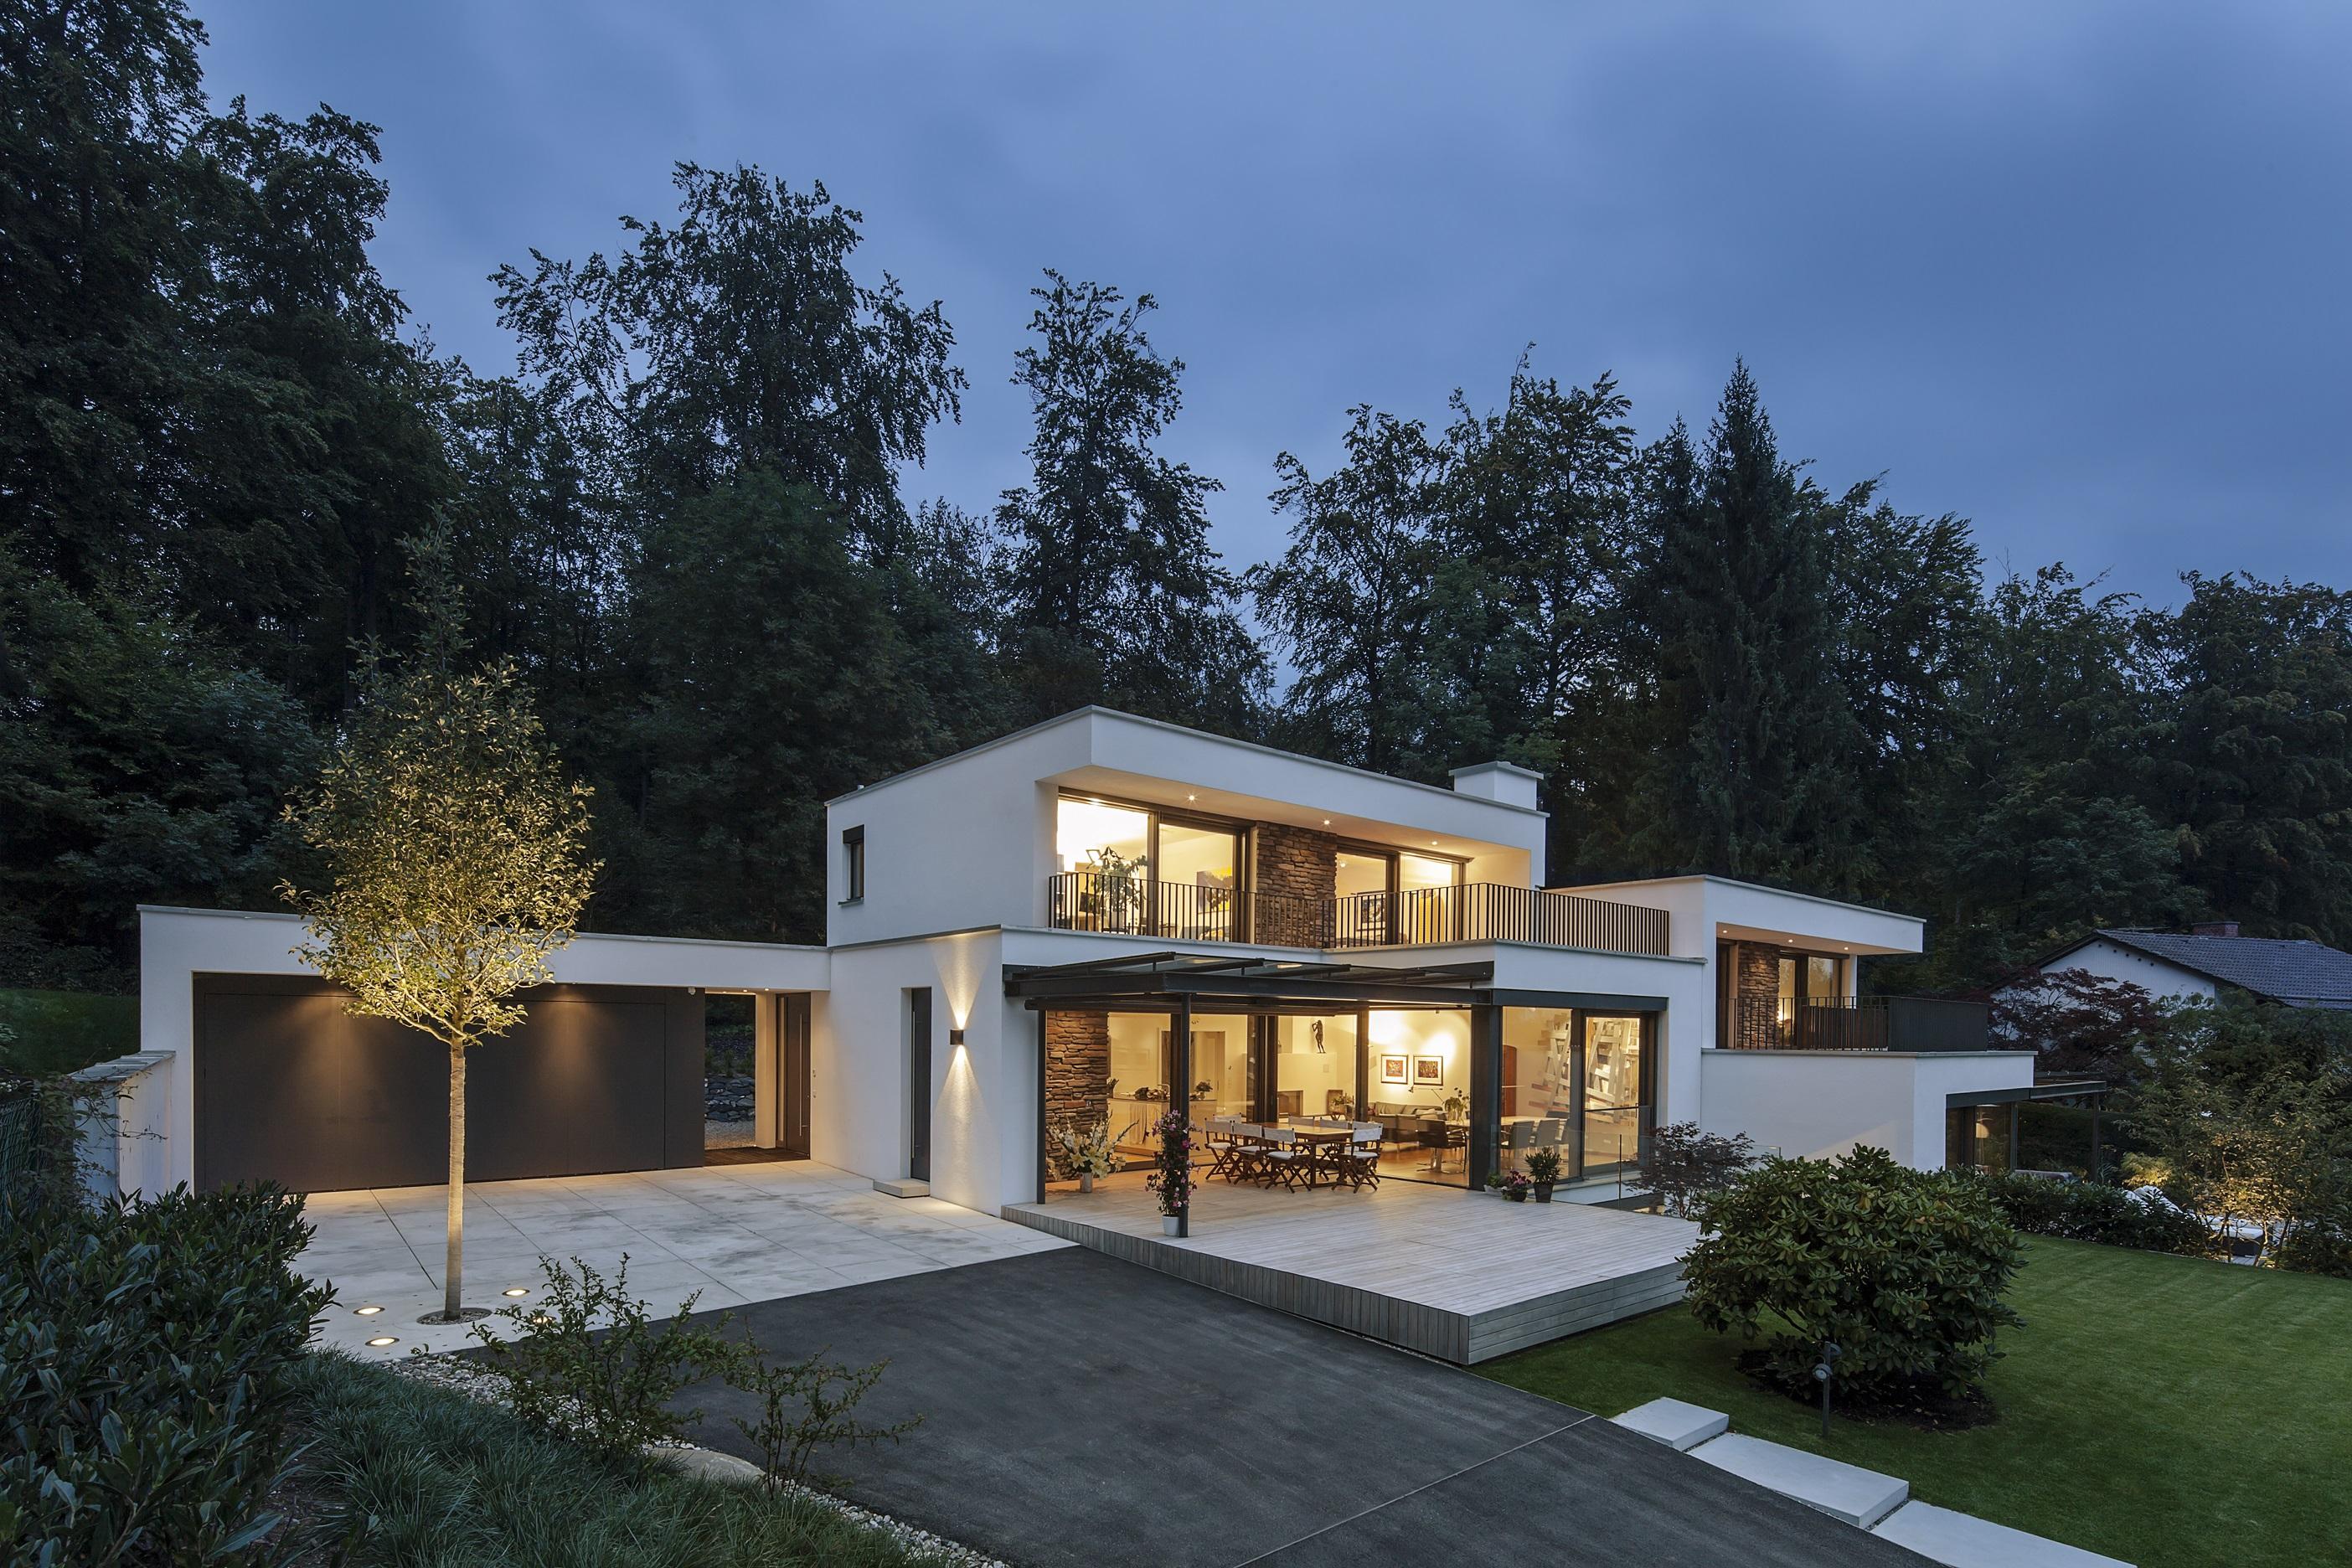 zwei villen am hang muenchenarchitektur. Black Bedroom Furniture Sets. Home Design Ideas